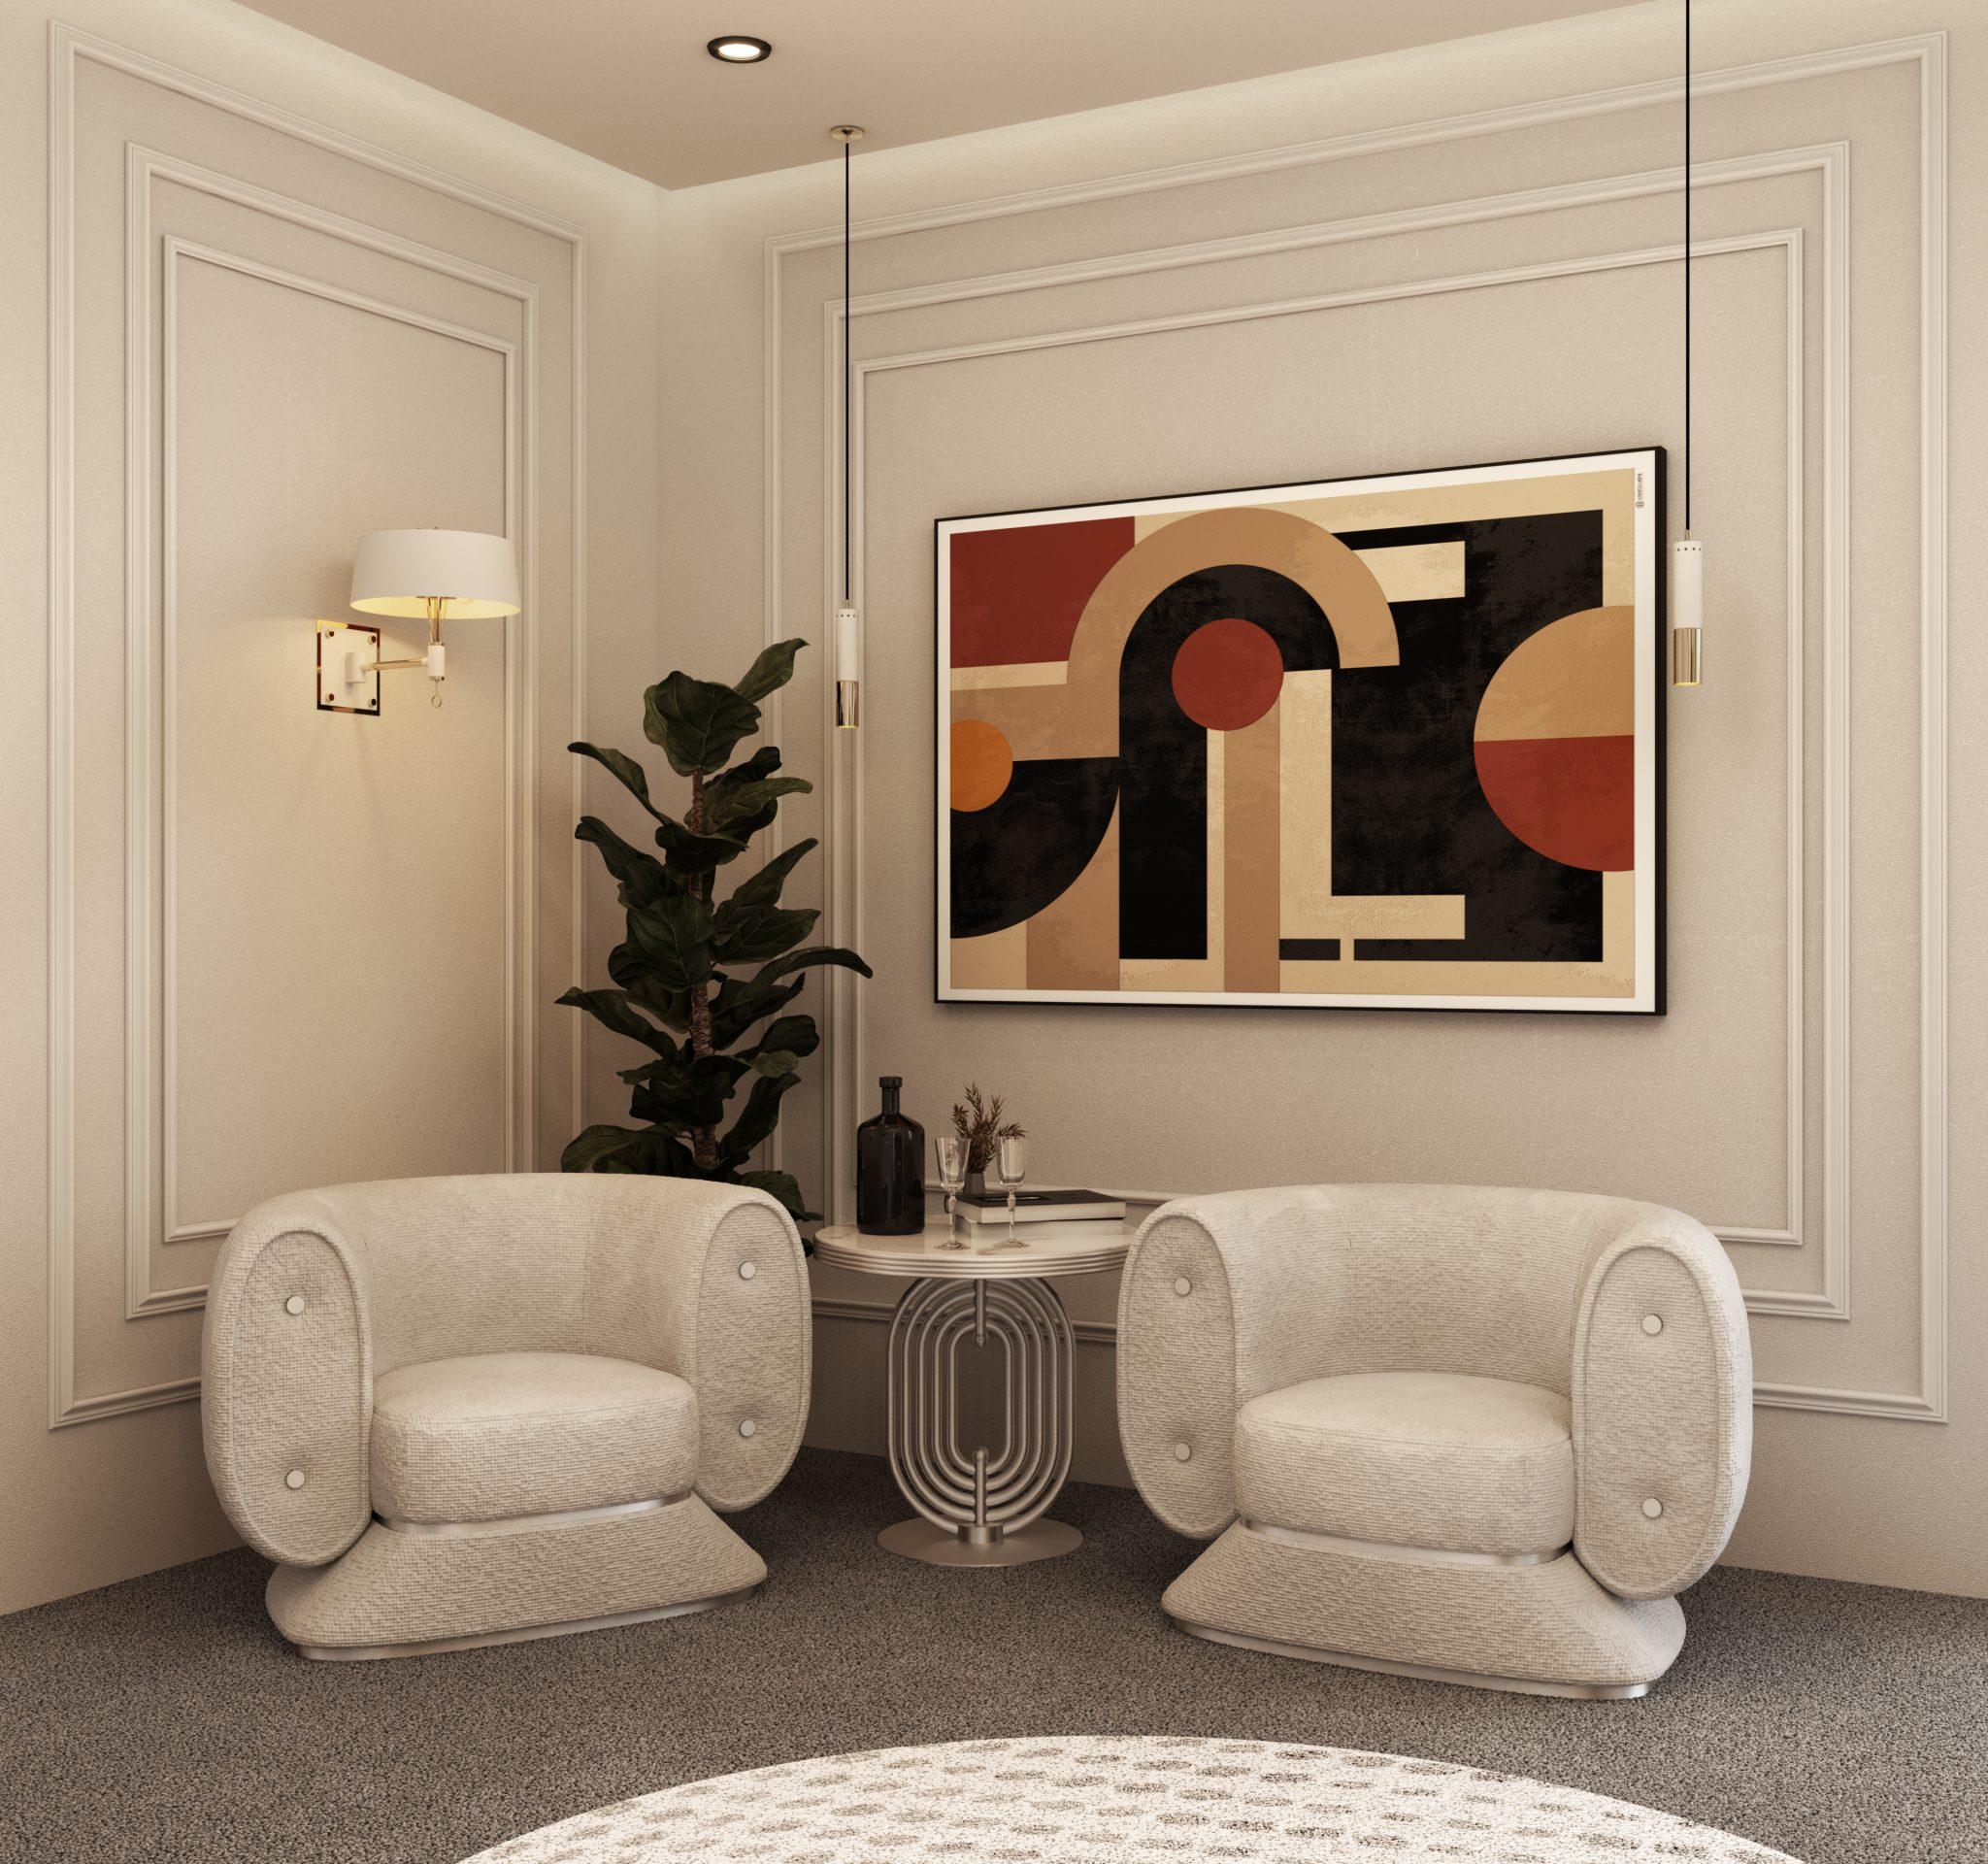 Elegant Mid-Century Modern Bedroom Design Ideas